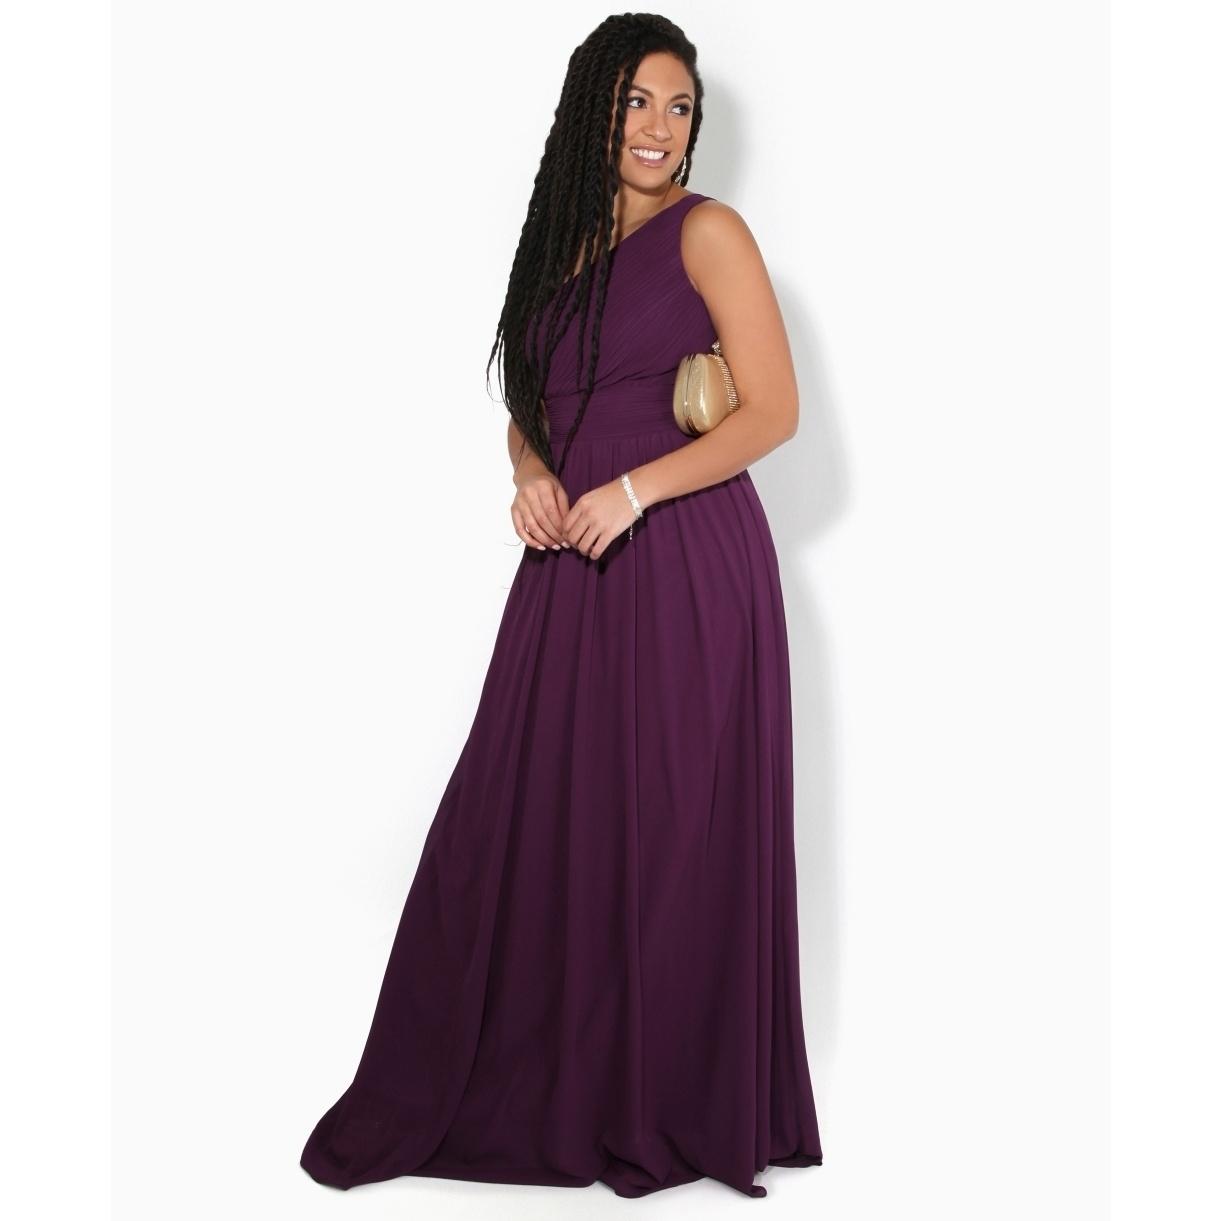 Krisp Womens/Ladies One Shoulder Evening Maxi Dress (16 UK) (Turquoise)